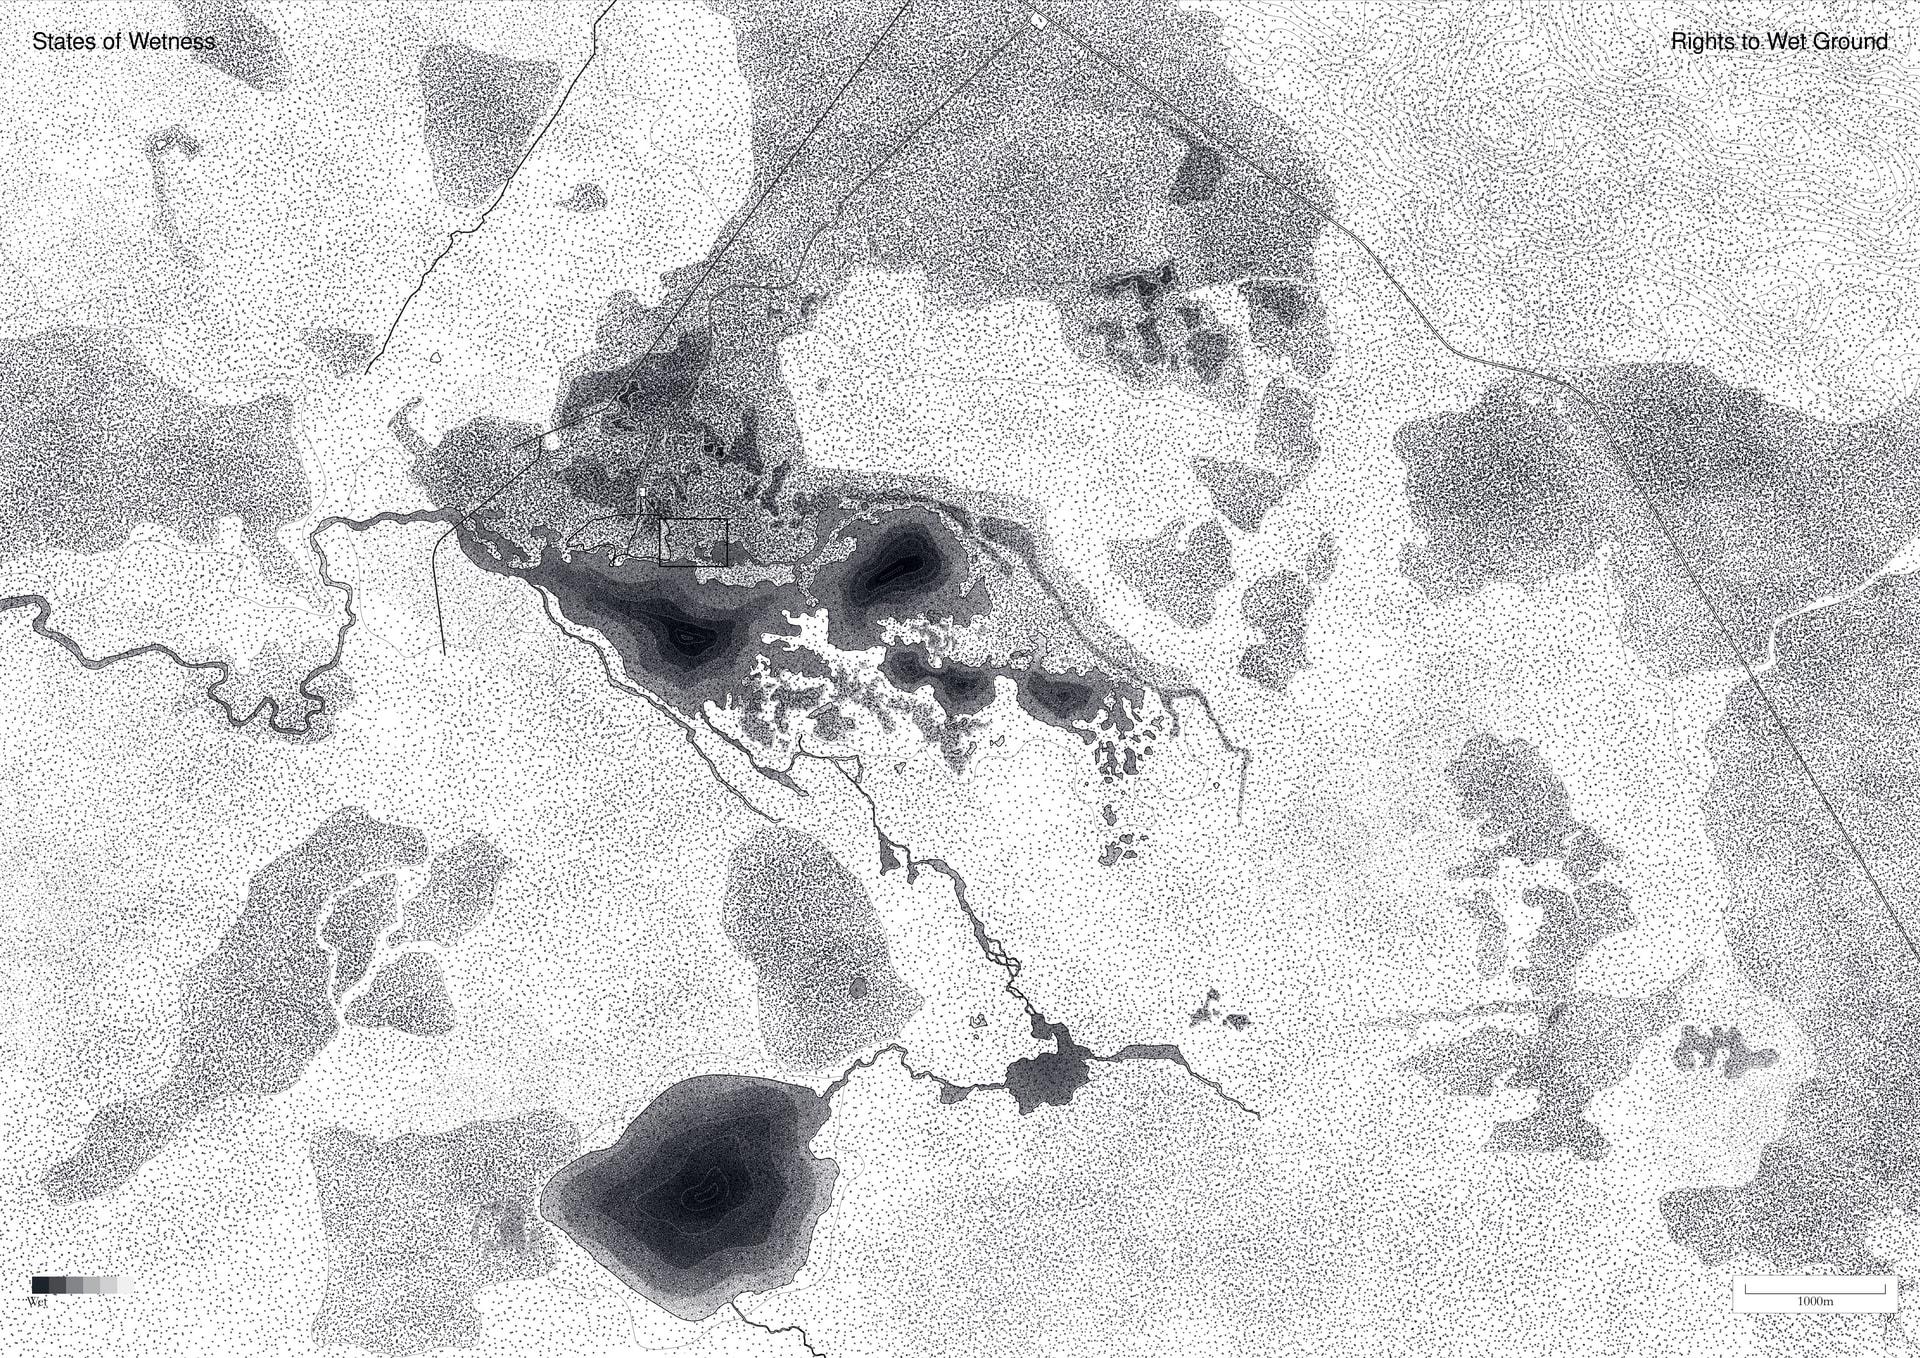 States of Wetness